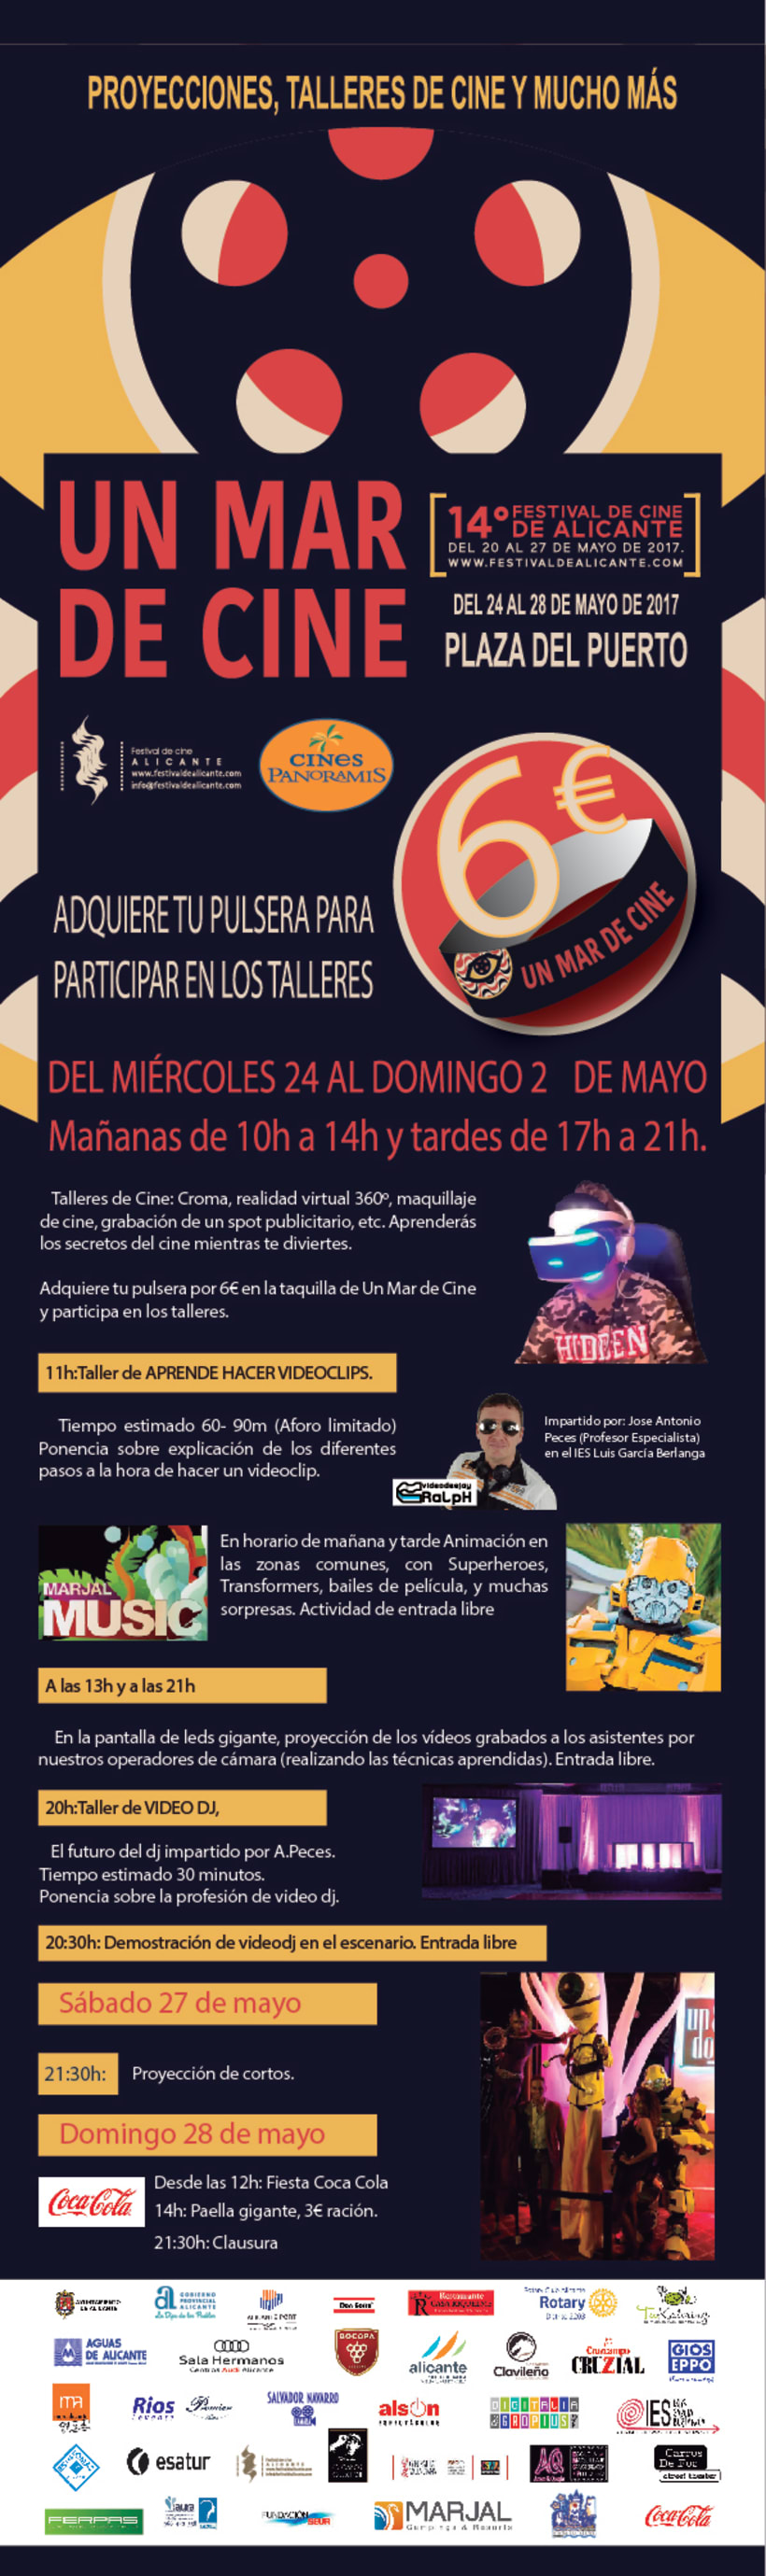 Festival de Cine Alicante 17